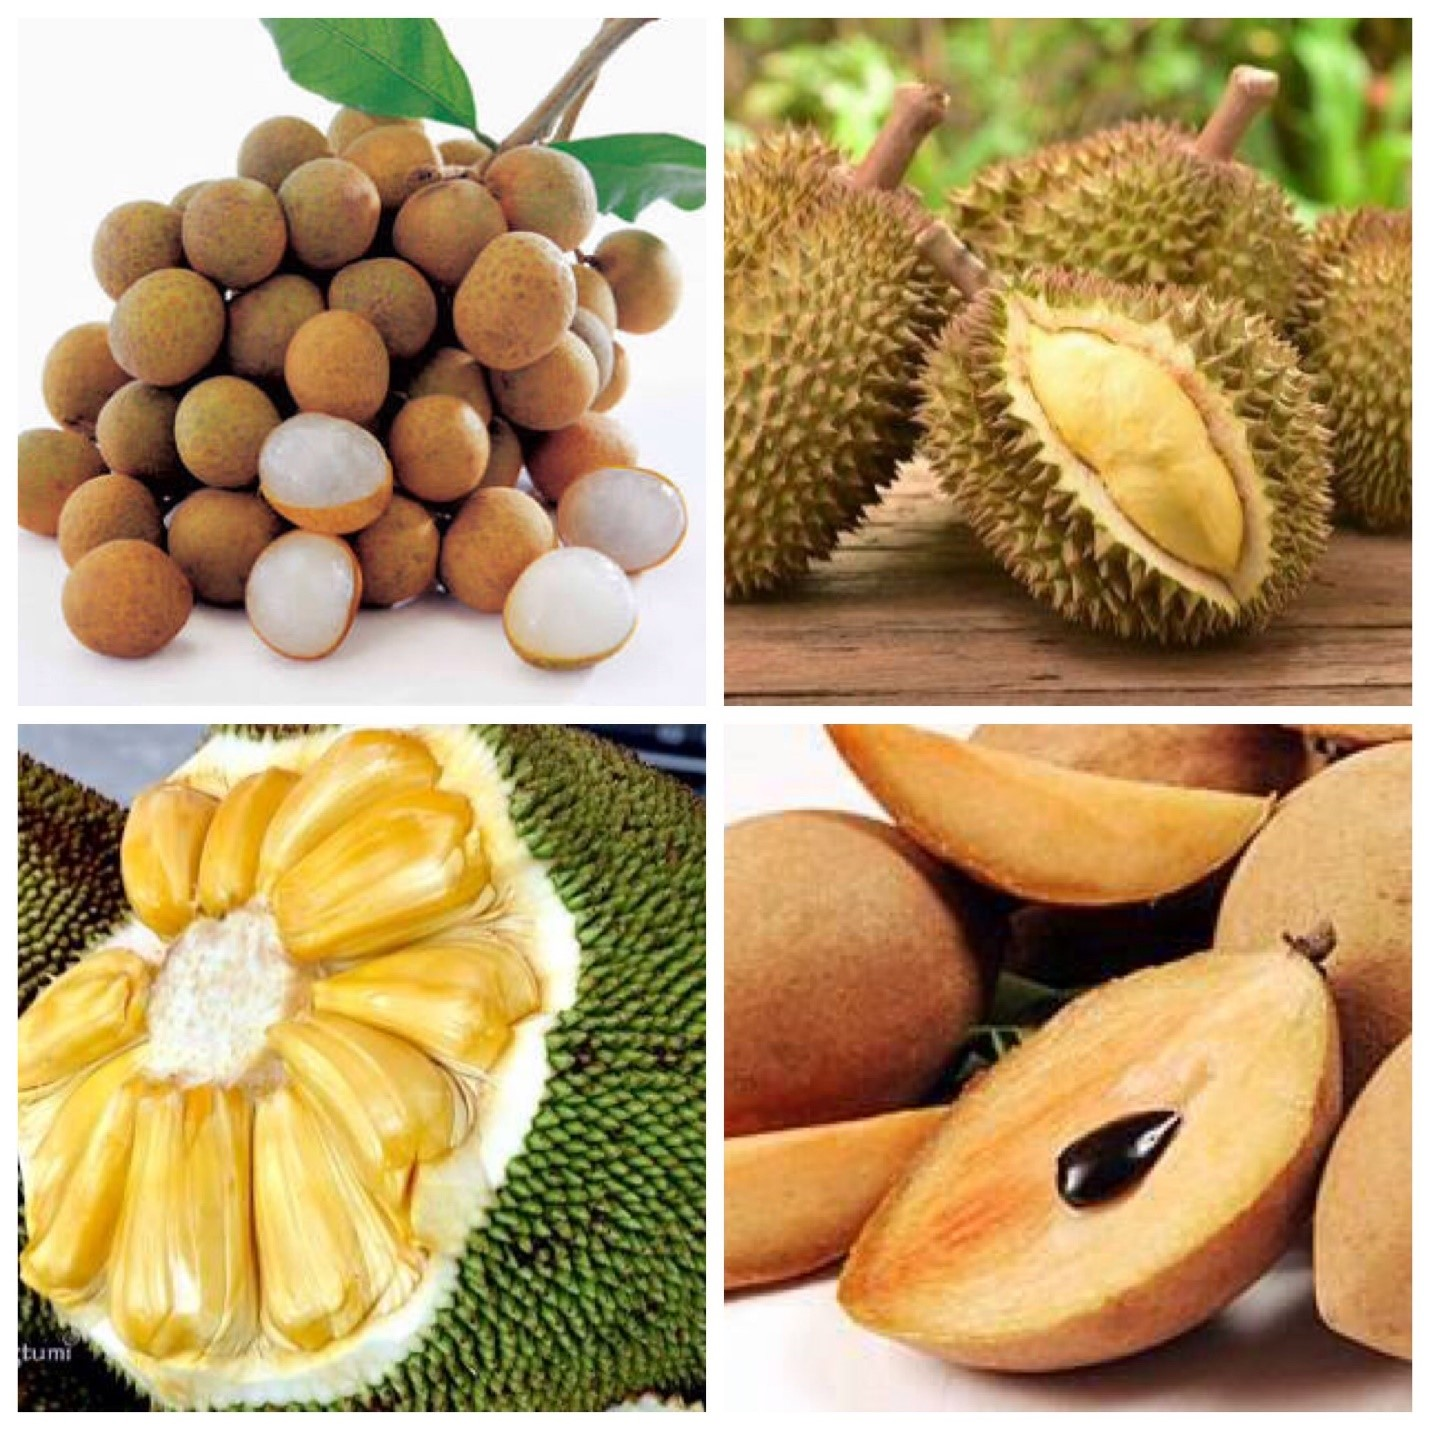 Penderita Diabetes, Sebaiknya Batasi Konsumsi Buah-buahan Ini!